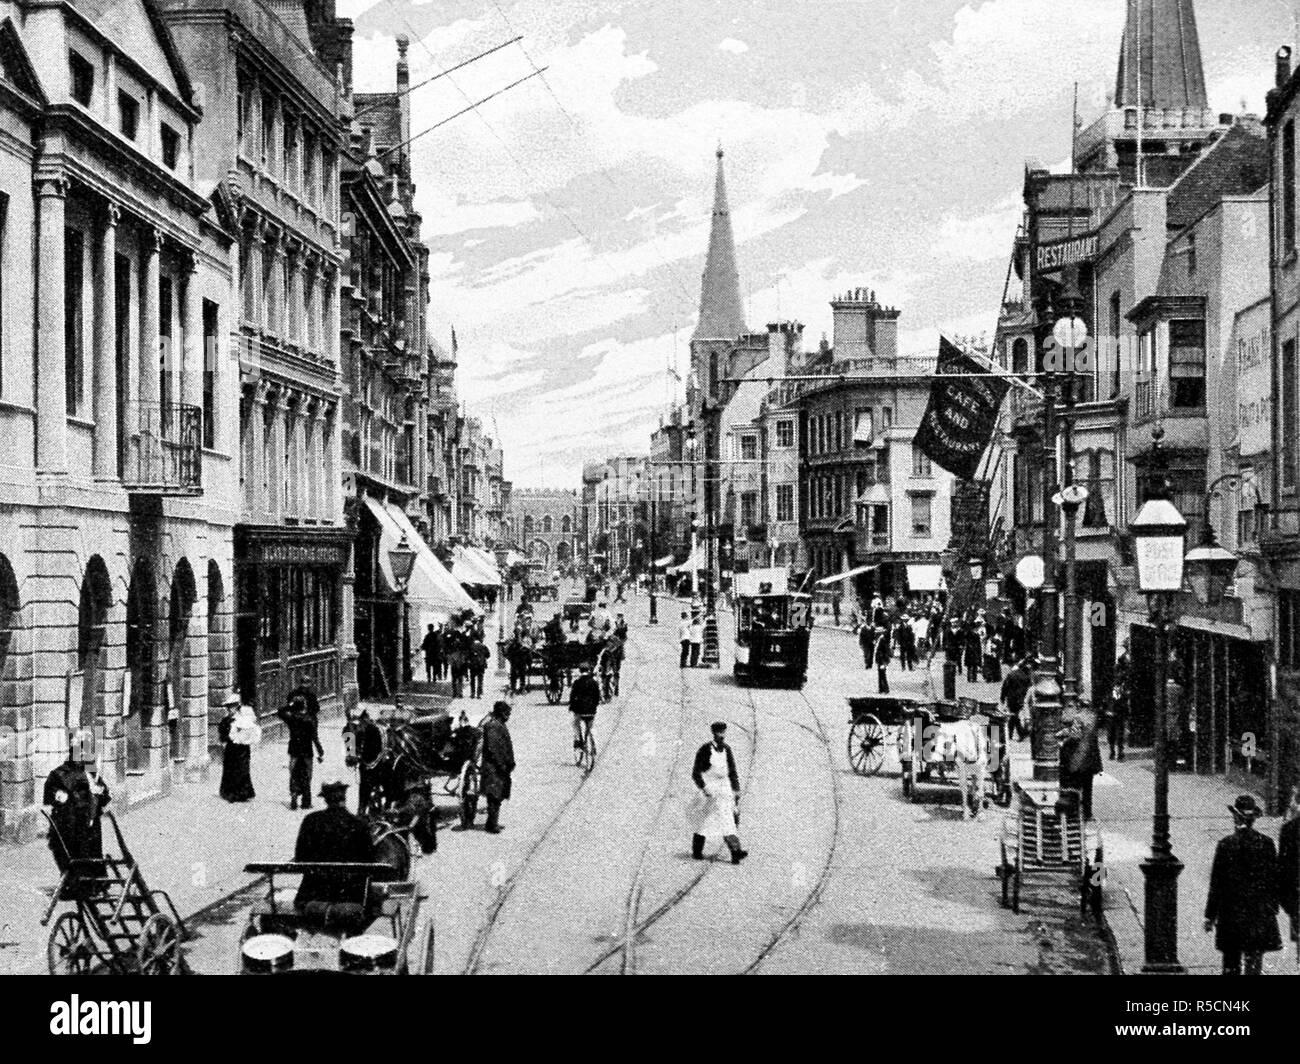 High Street, Southampton - Stock Image